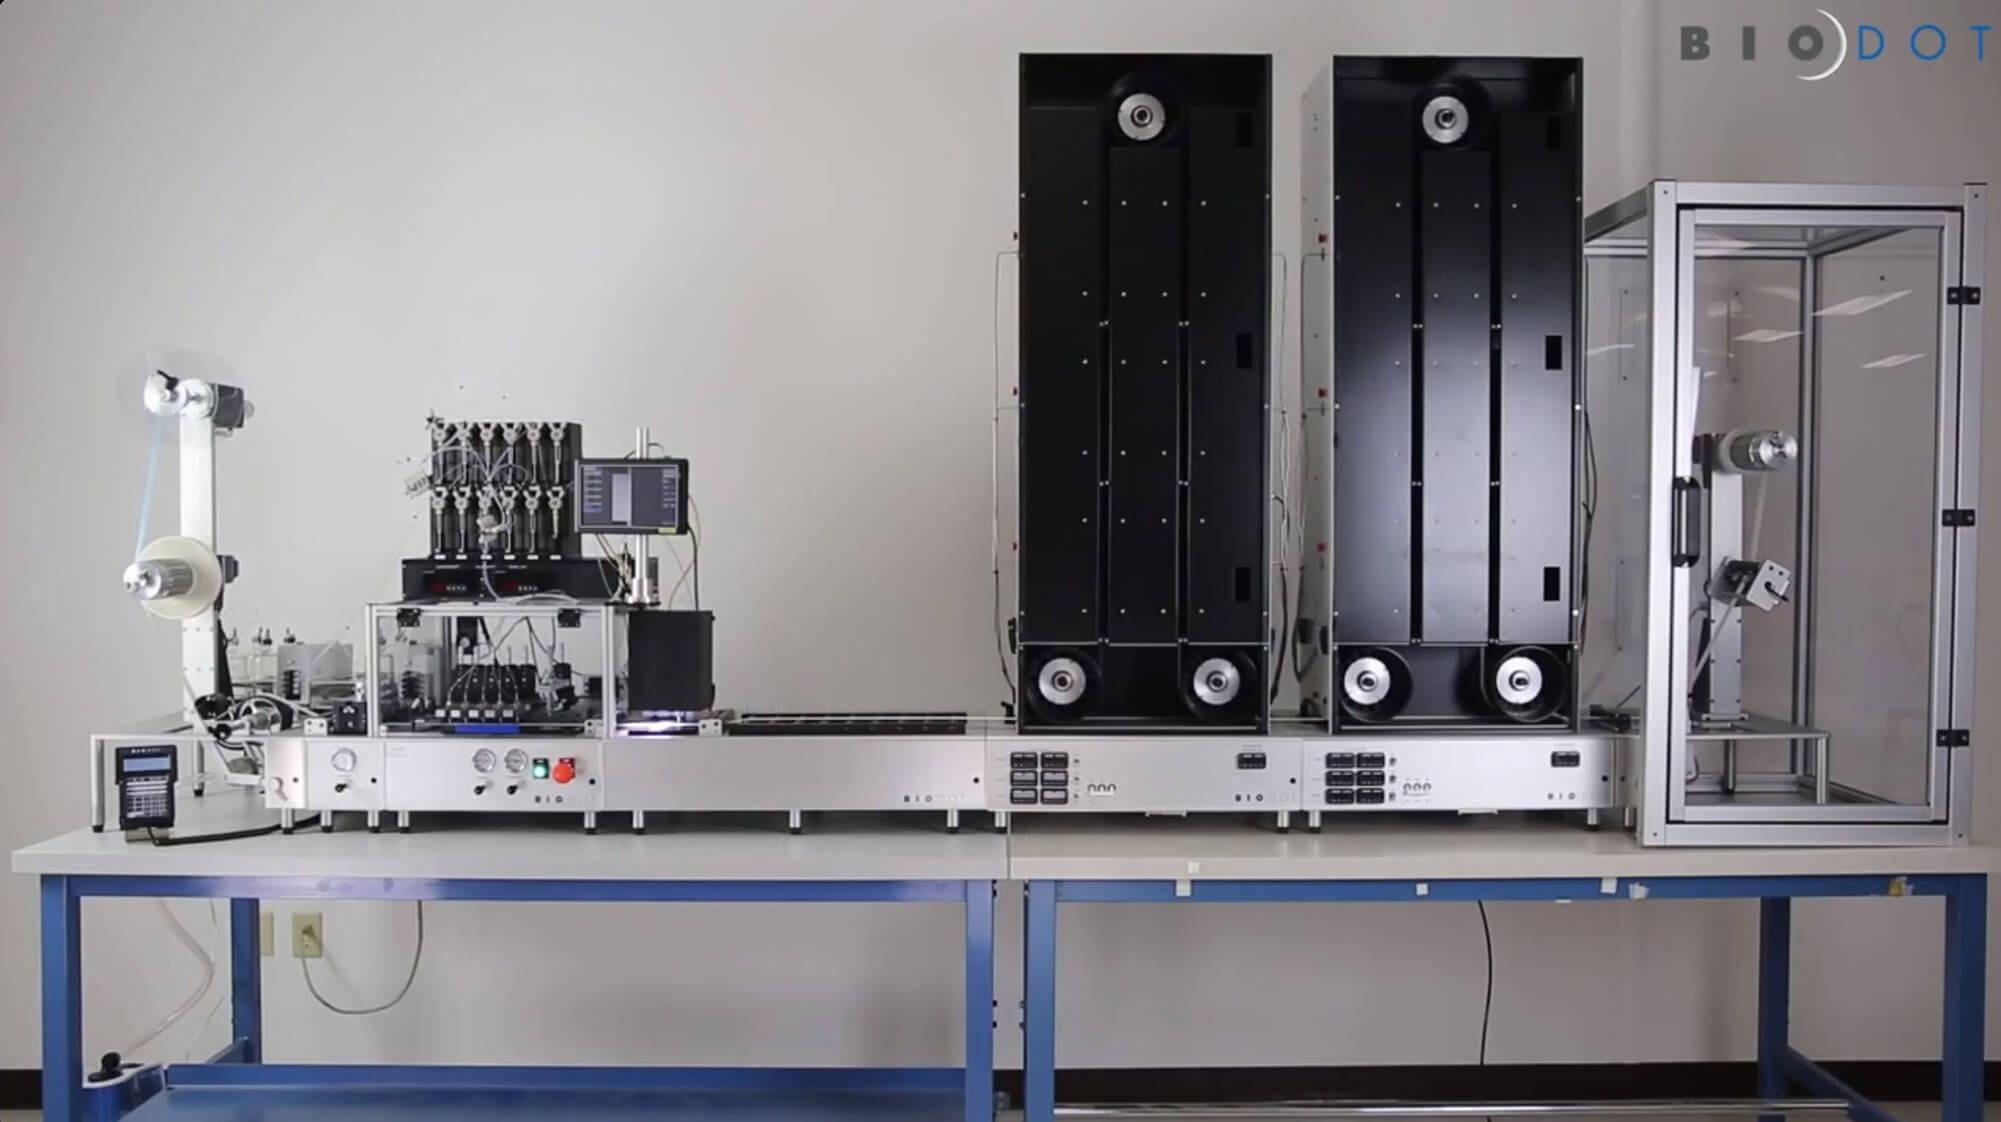 RR120 Web System